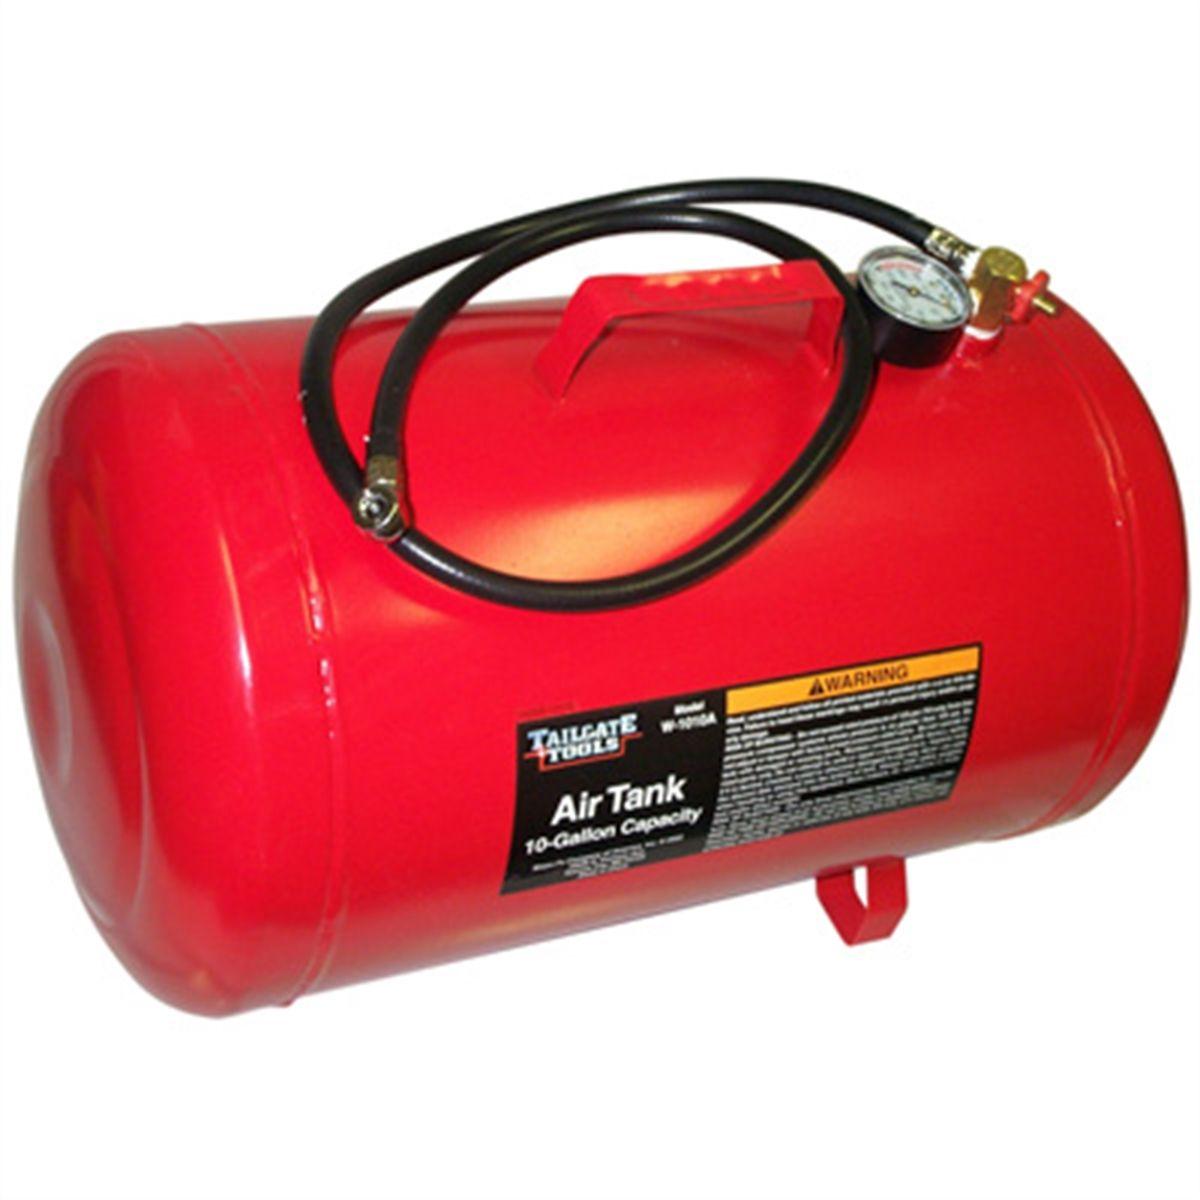 Omega gallon portable air tank w a